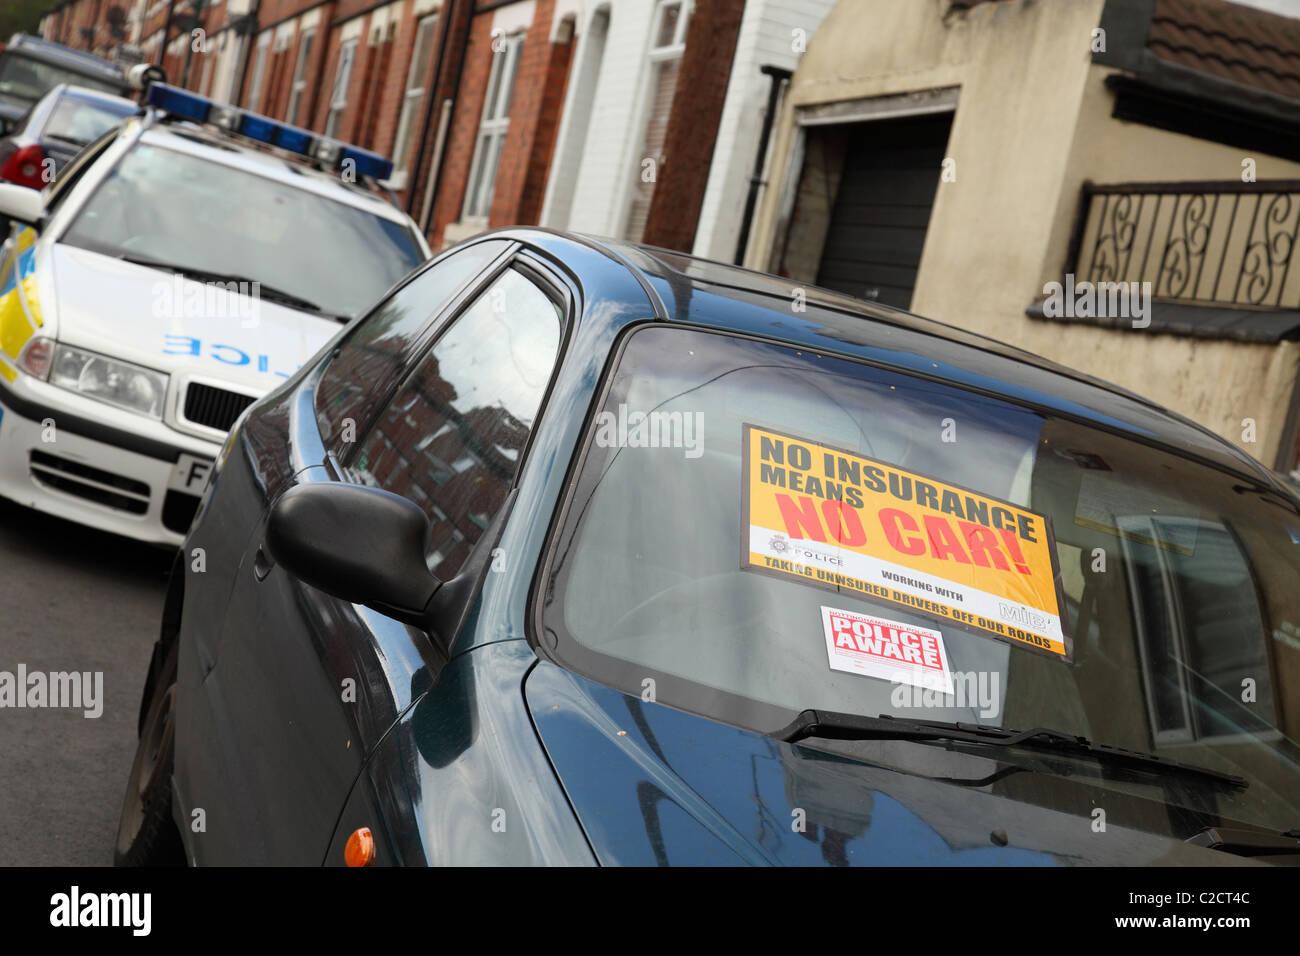 Police seize an uninsured car on a street in Nottingham, England, U.K. - Stock Image